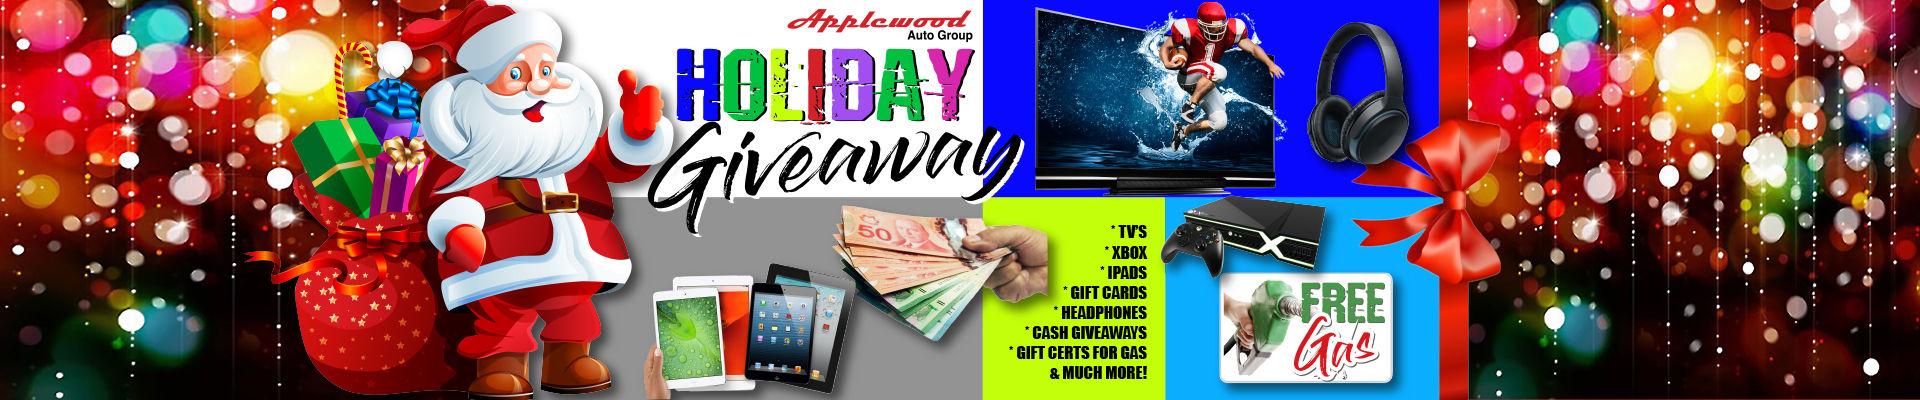 Applewood Holiday Giveaway